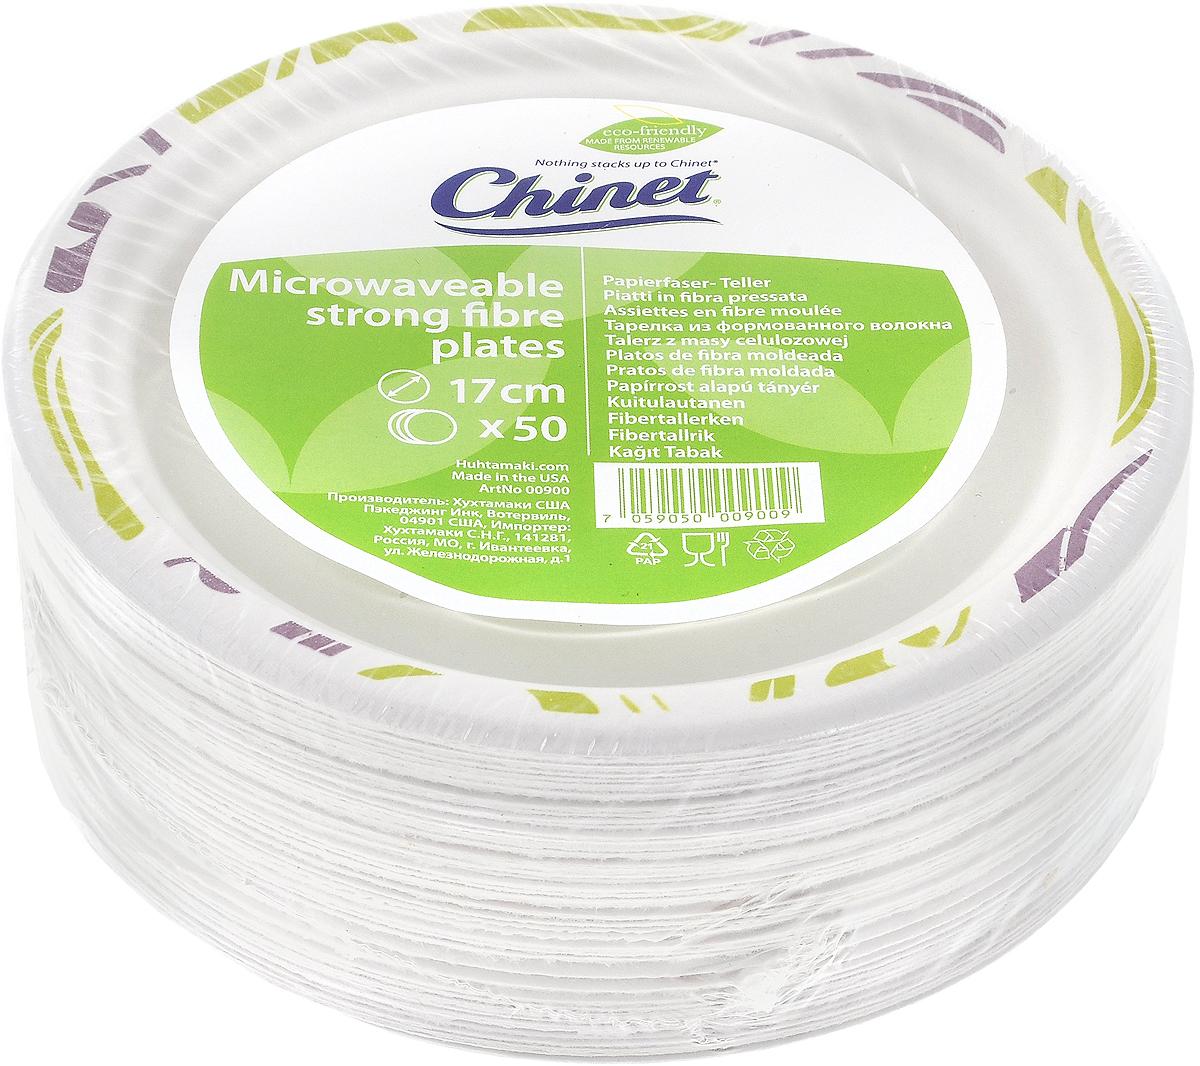 Набор одноразовых тарелок Huhtamaki Chinet, диаметр 17 см, 50 шт набор одноразовых тарелок эврика с пламенным приветом диаметр 19 см 6 шт